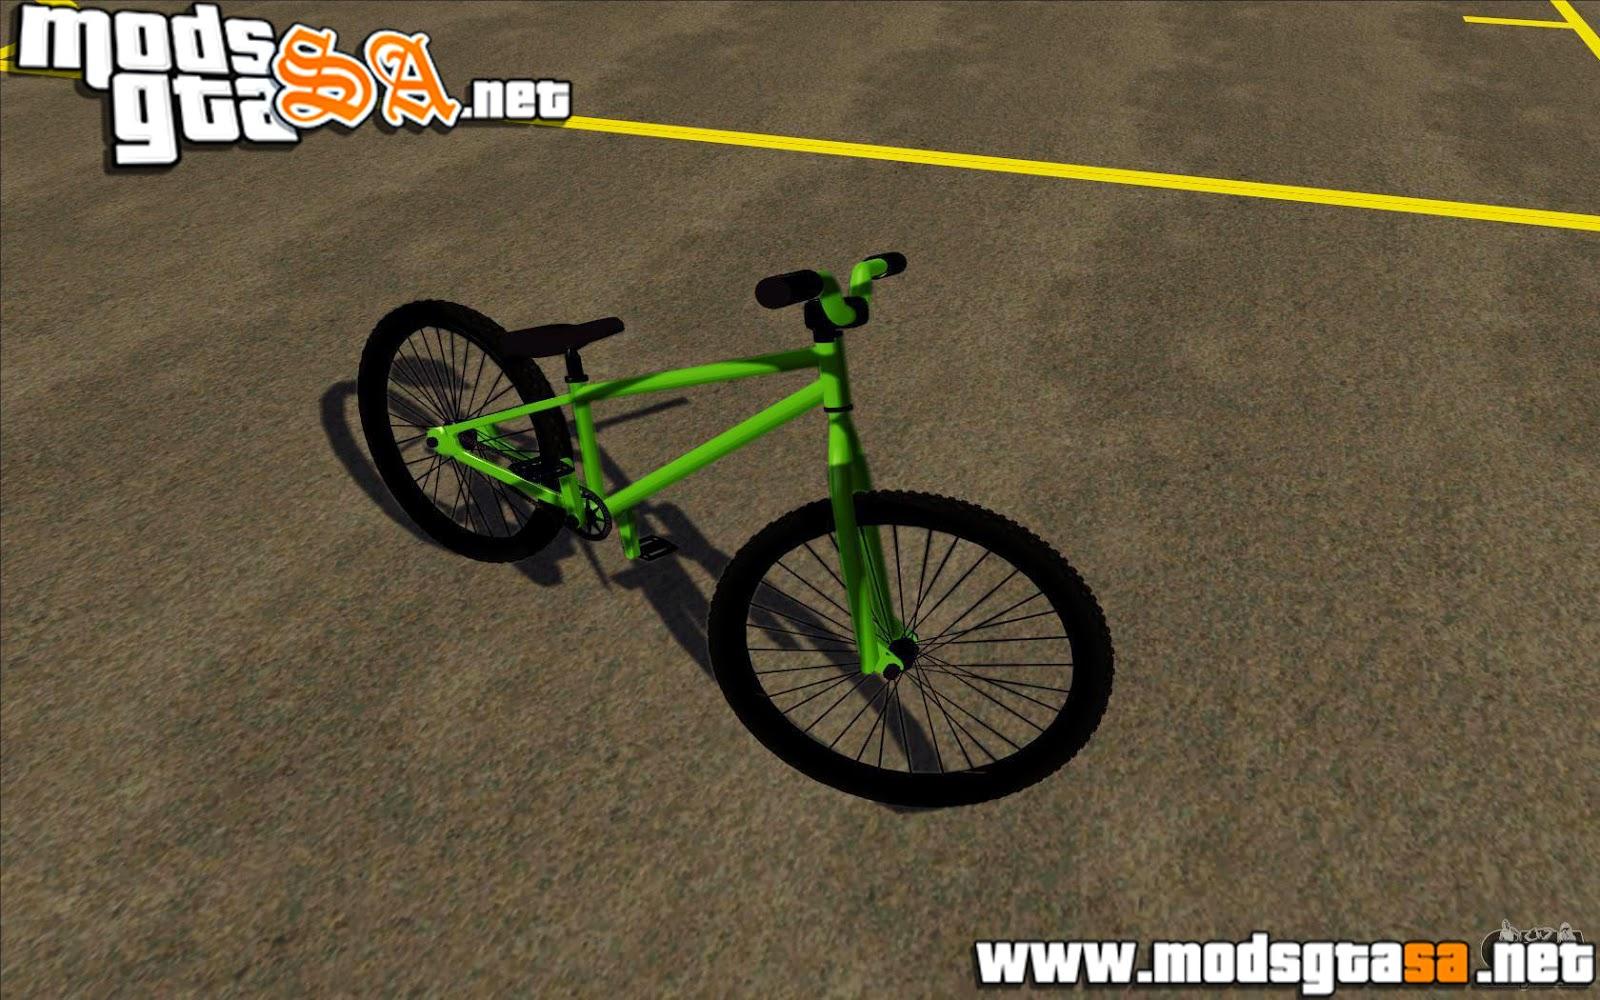 SA - Street MTB bike